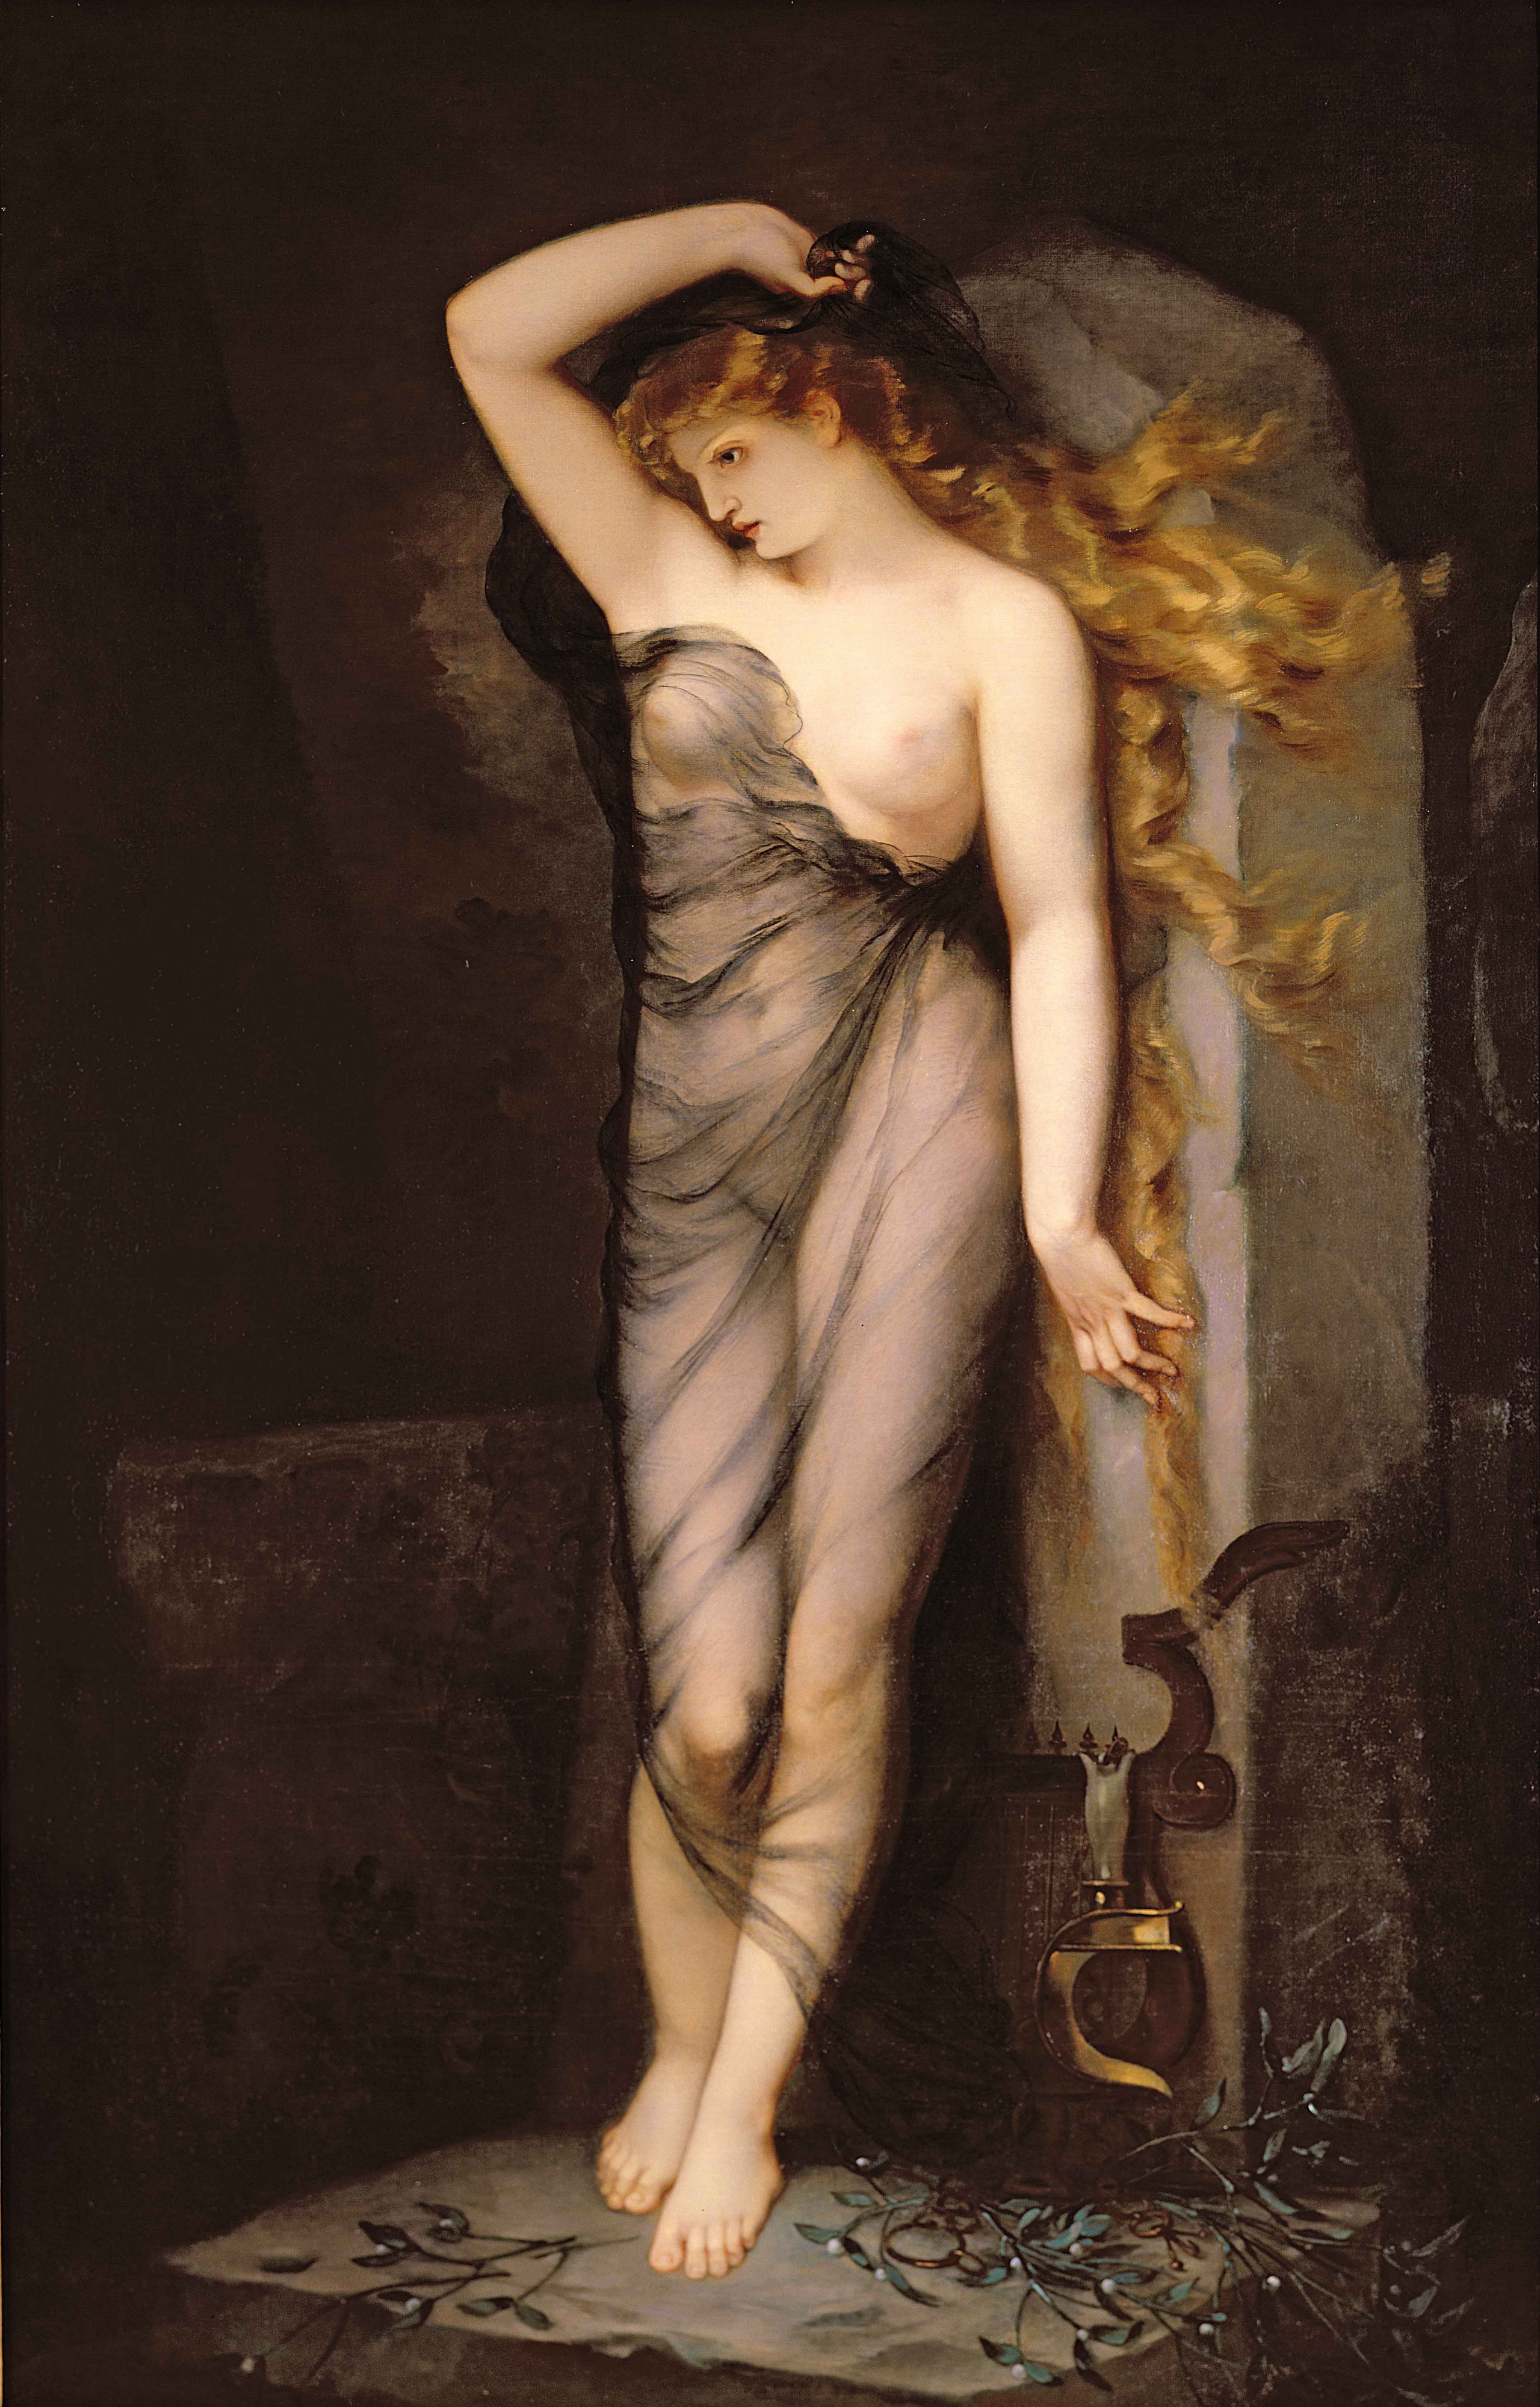 Charles Voillemot, 1823-1893. Велледа. 1869. 230 х 145 см. Частная коллекция